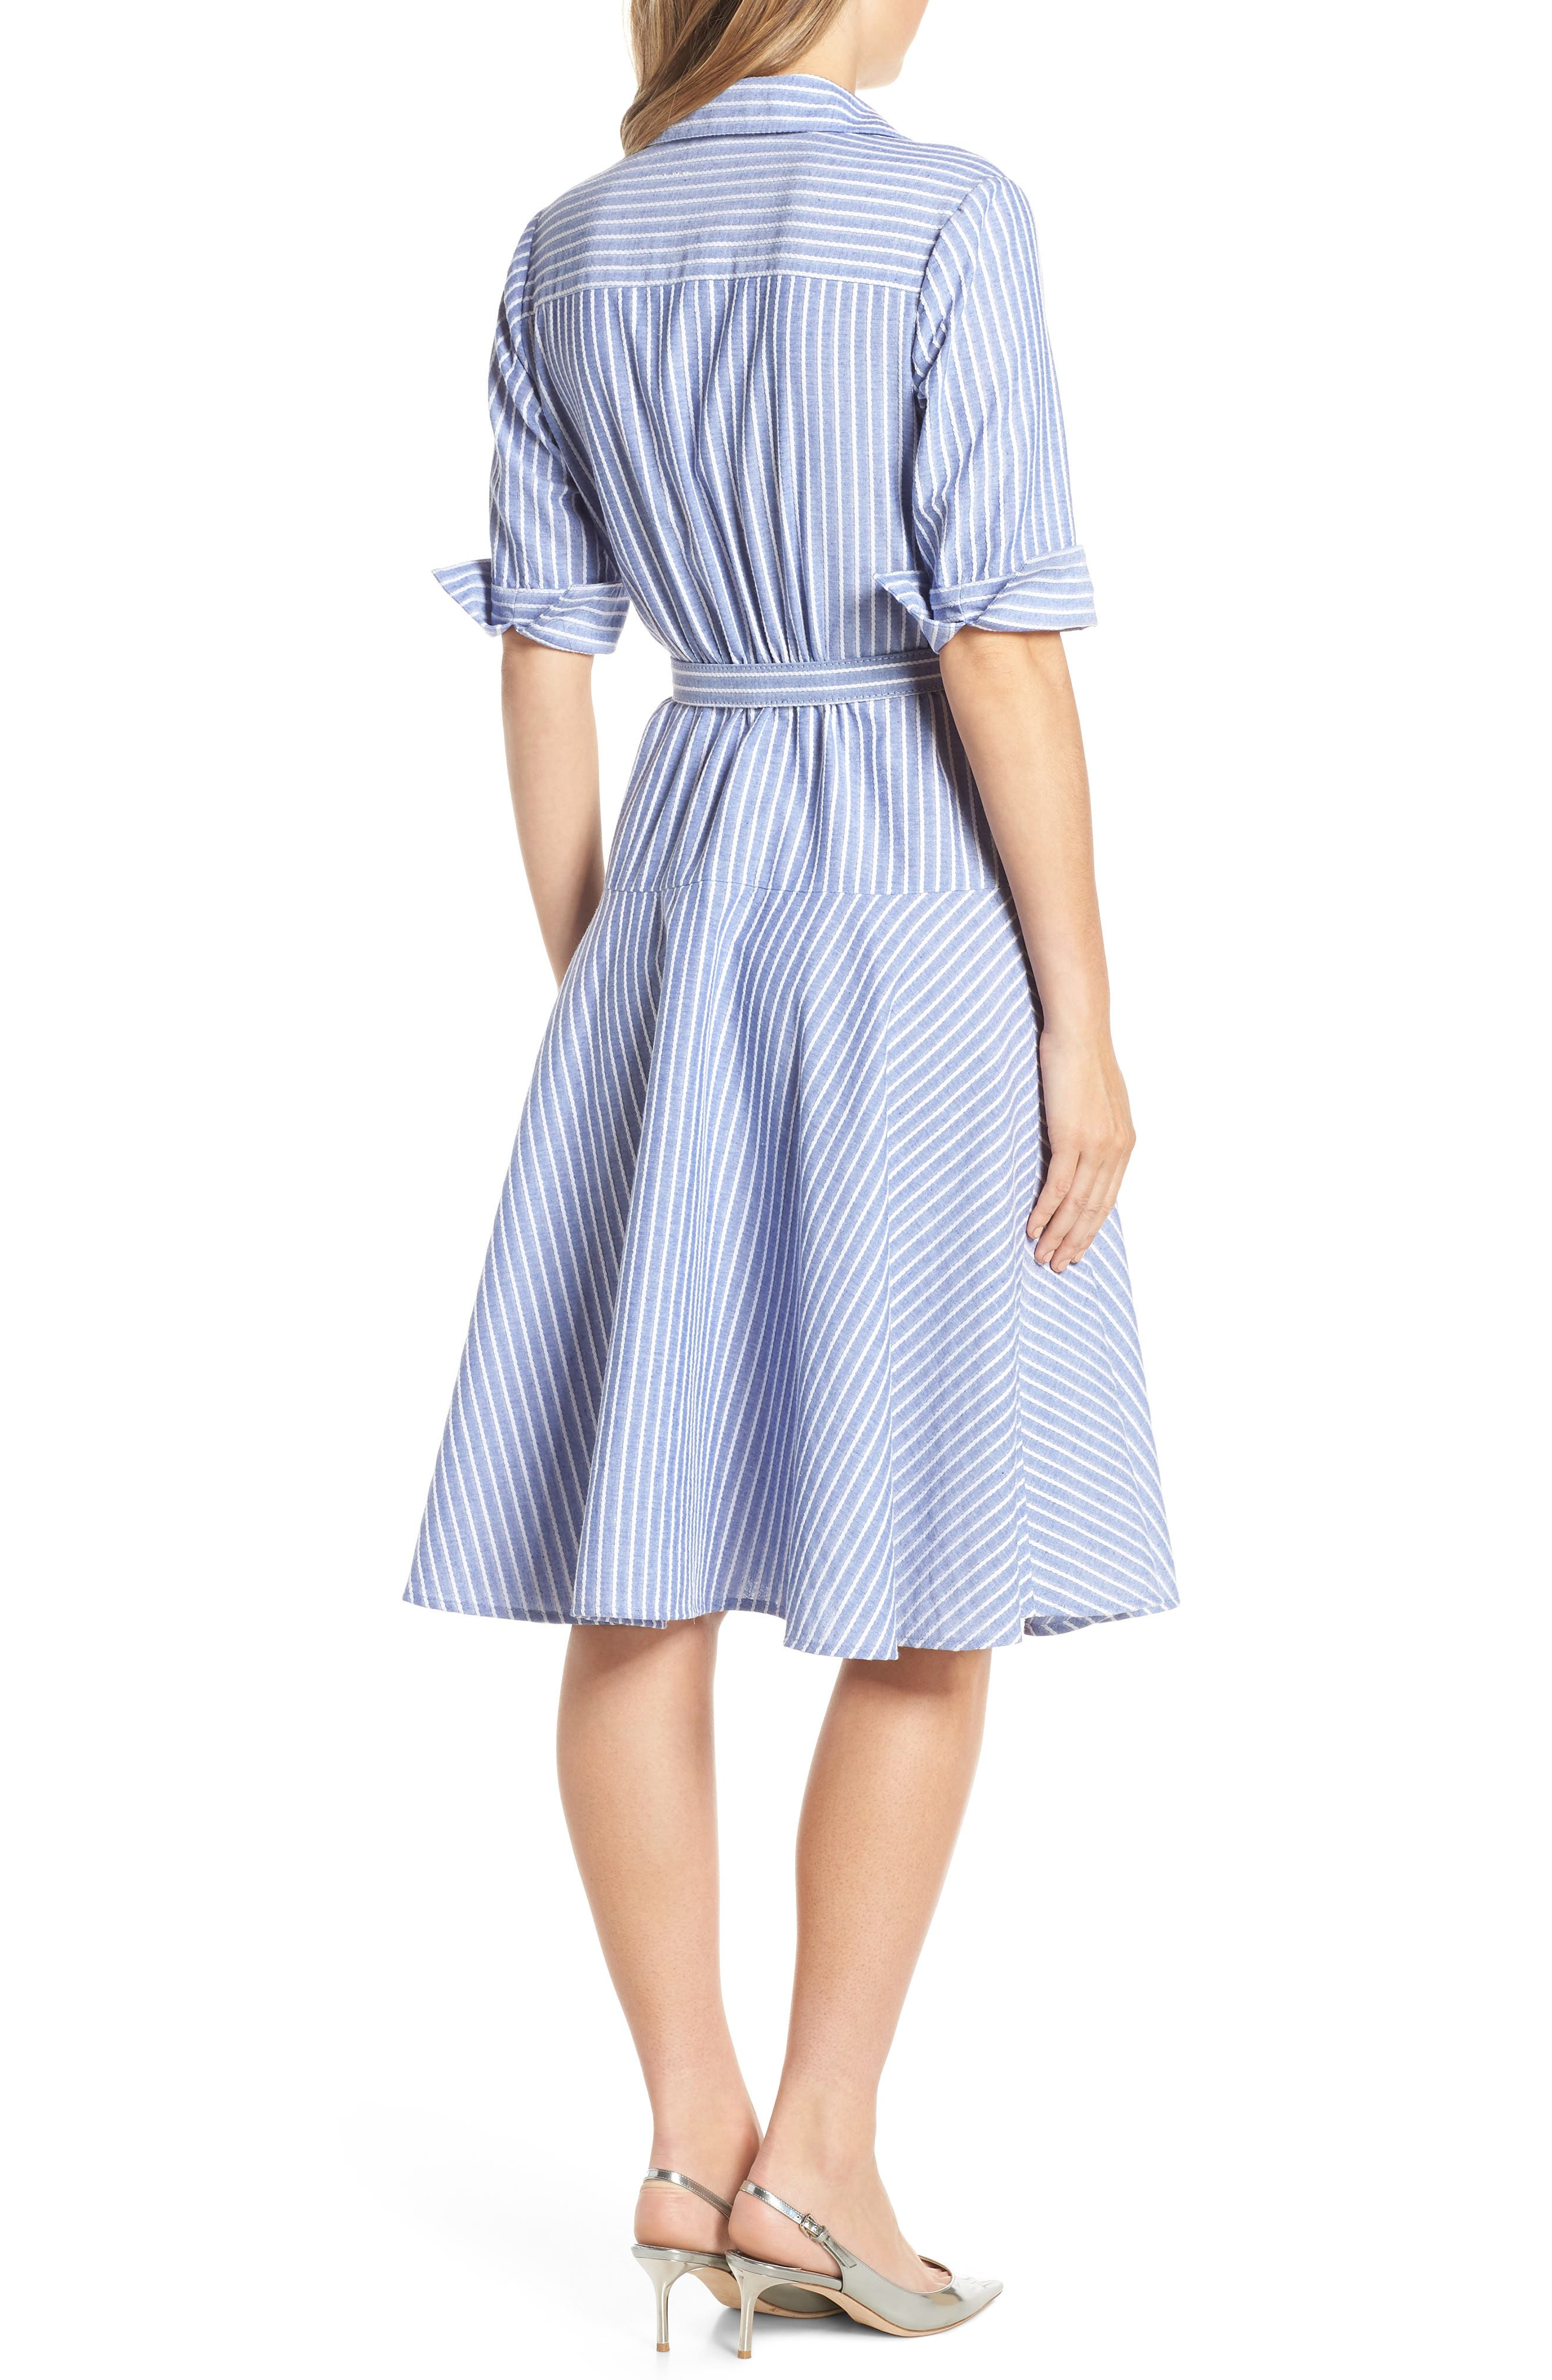 ab24701c61bd Women s Shirtdresses   T-Shirt Dresses